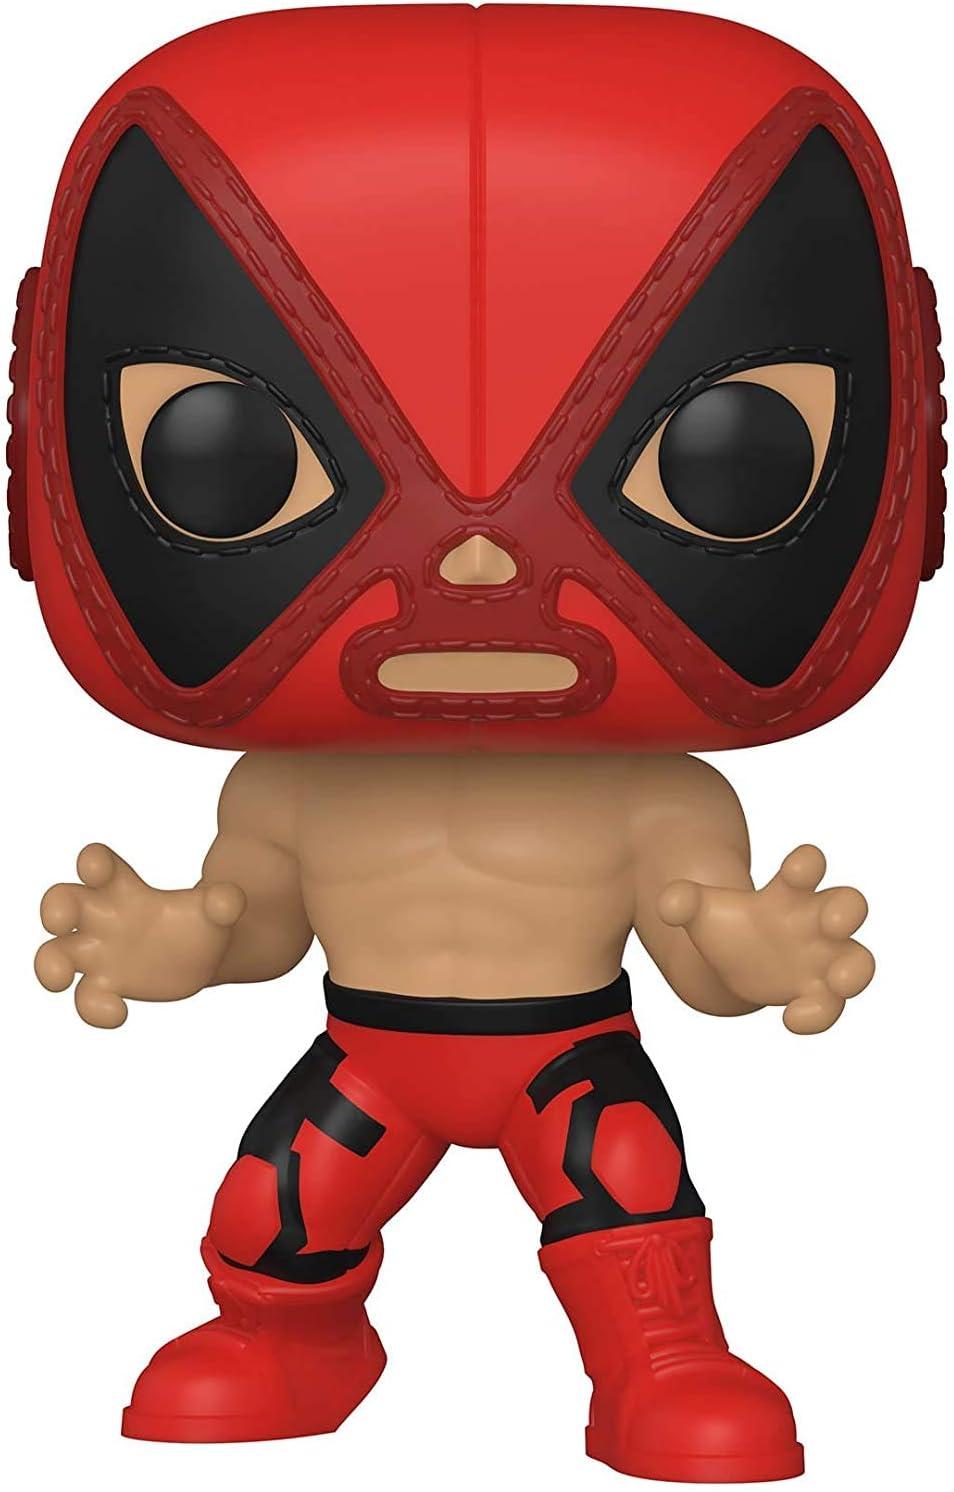 Captain Marvel Deadpool Funko Pop Hulk Venom and Wolverine Iron Man Marvel Lucha Libre Set of 7: Spider-Man